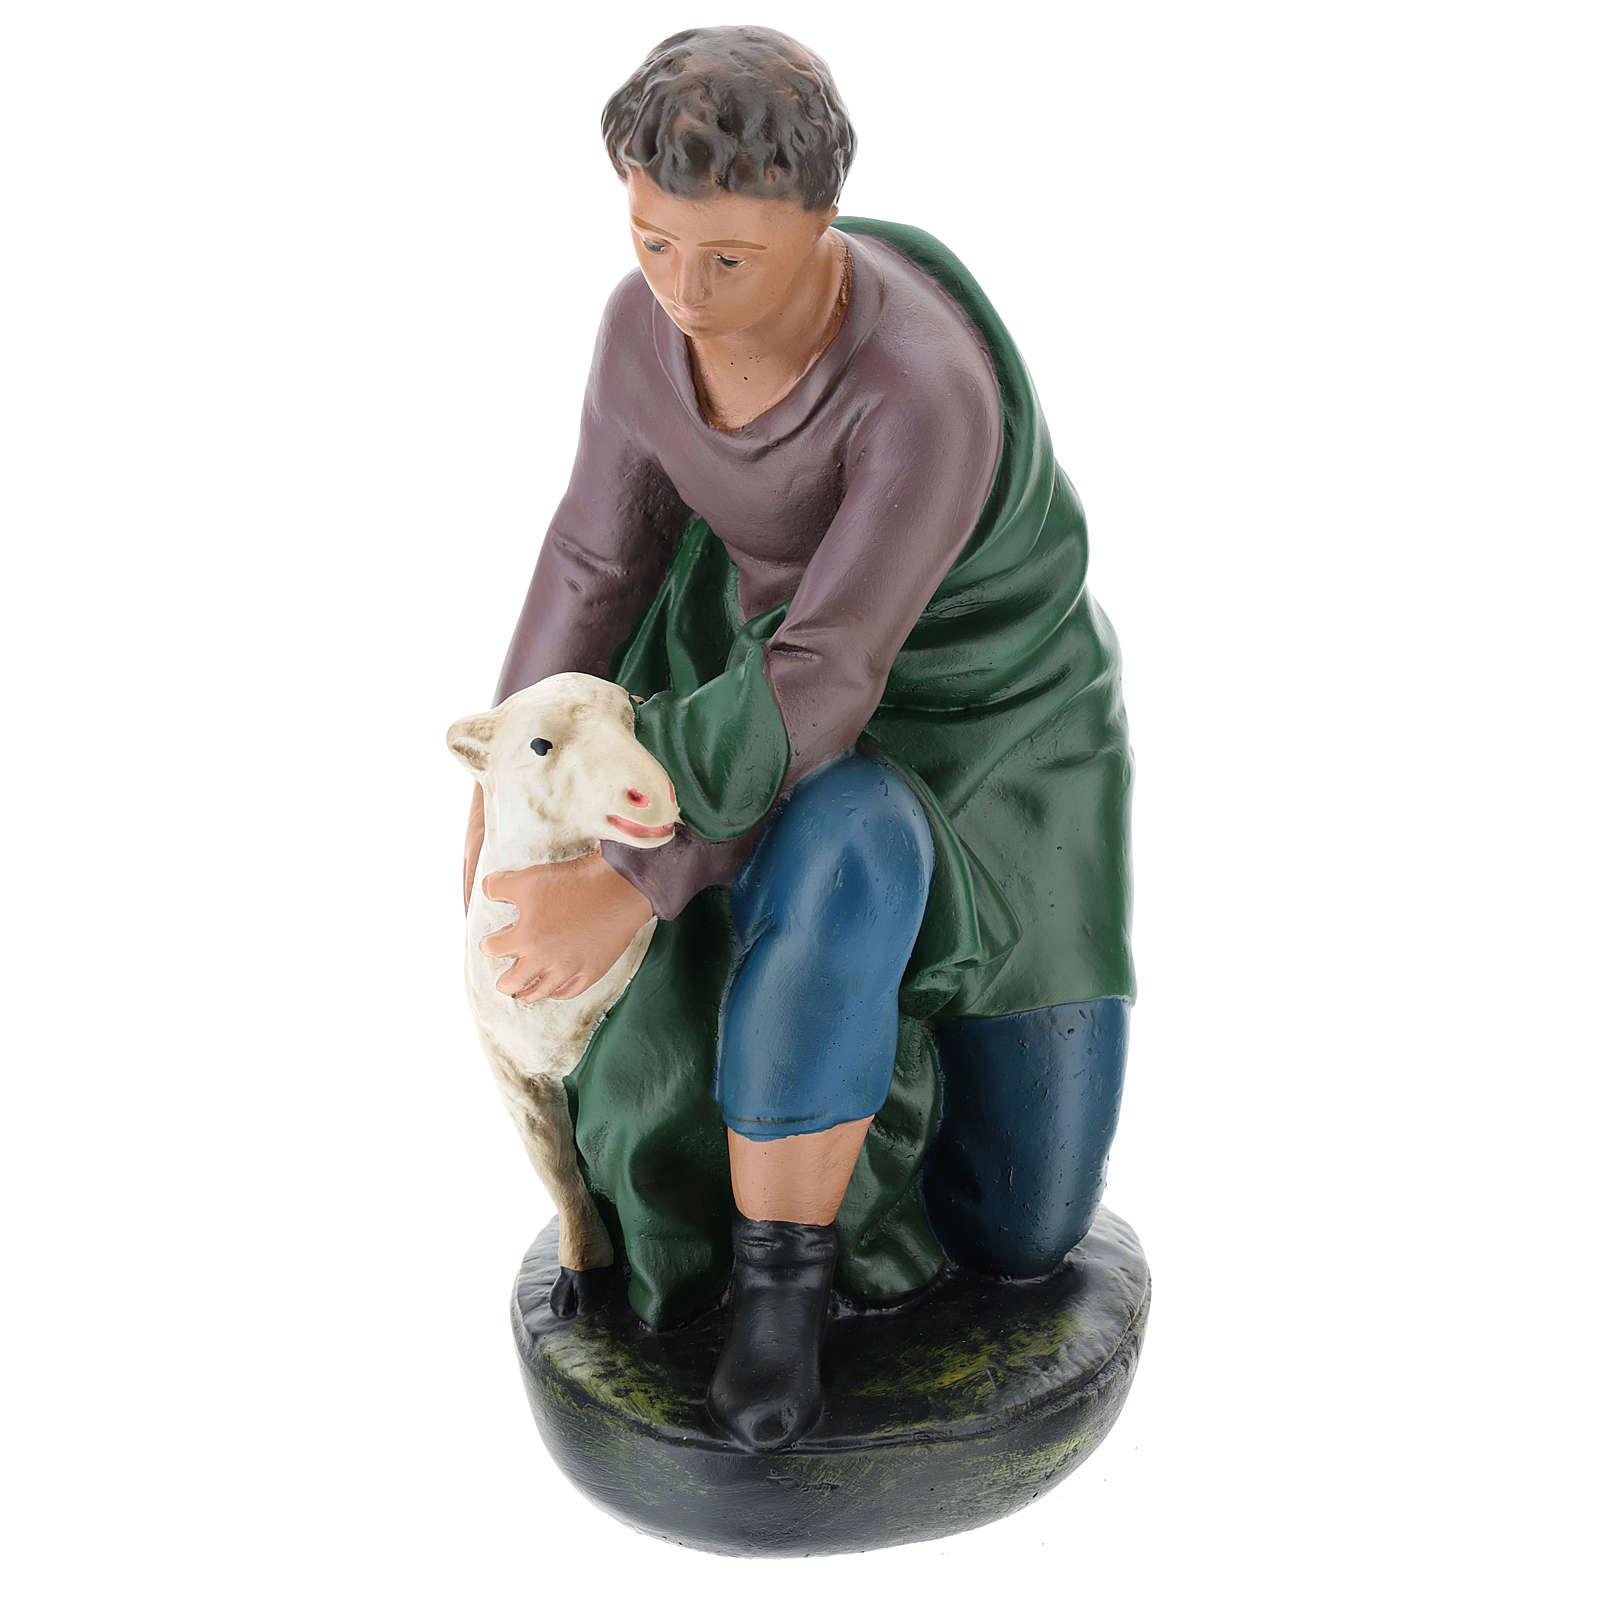 Pastor de rodillas con oveja belenes Arte Barsanti 30 cm 4